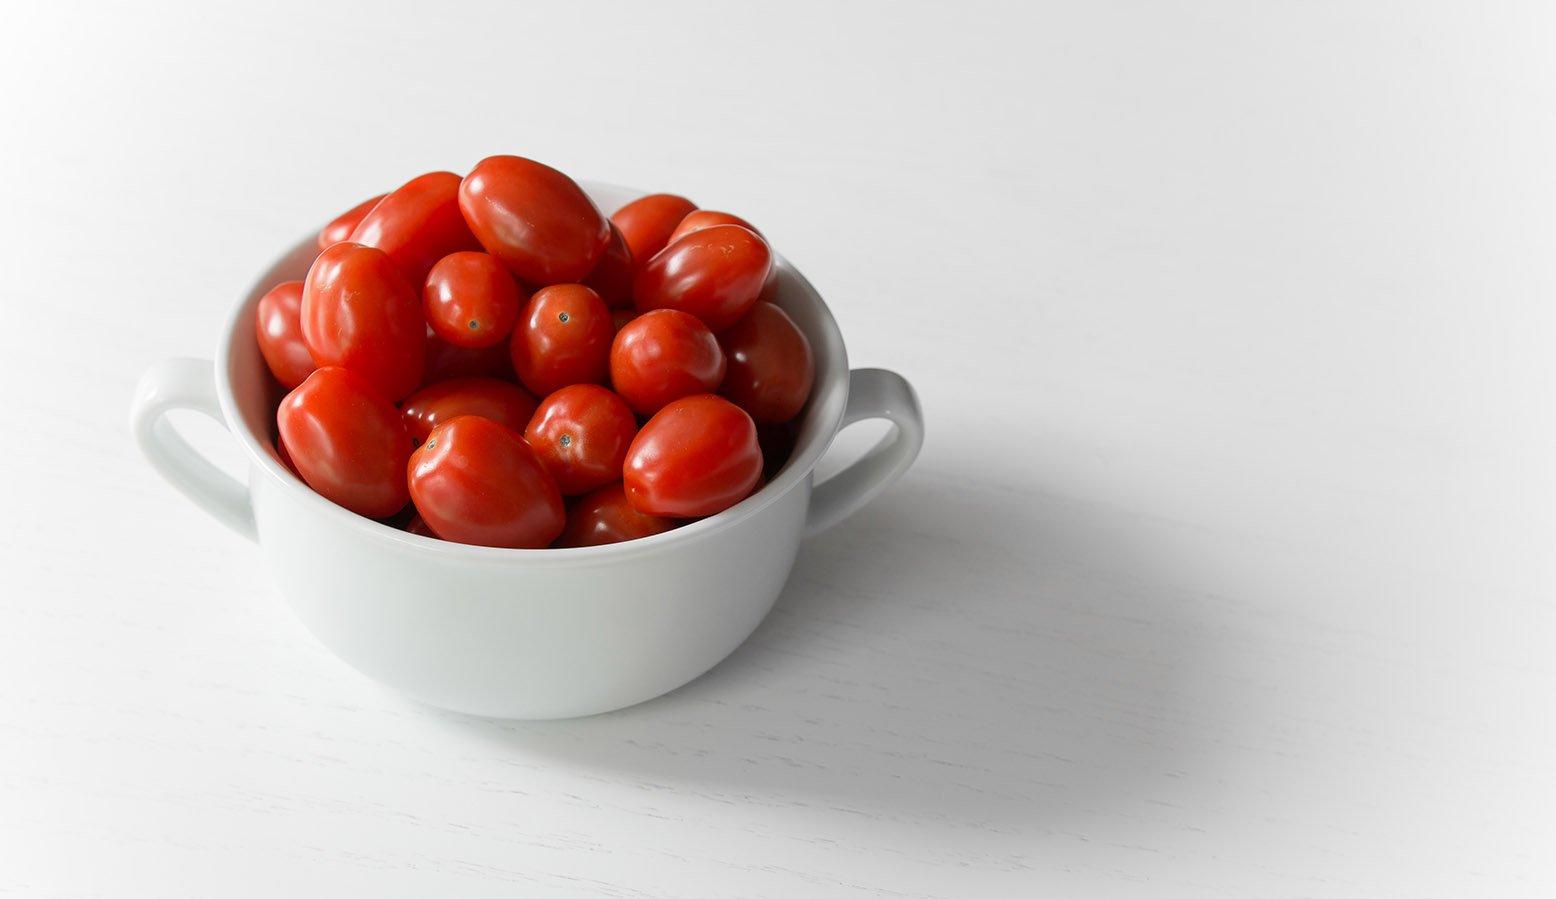 Tomato Mozzarella Salad 1 (1 of 1)